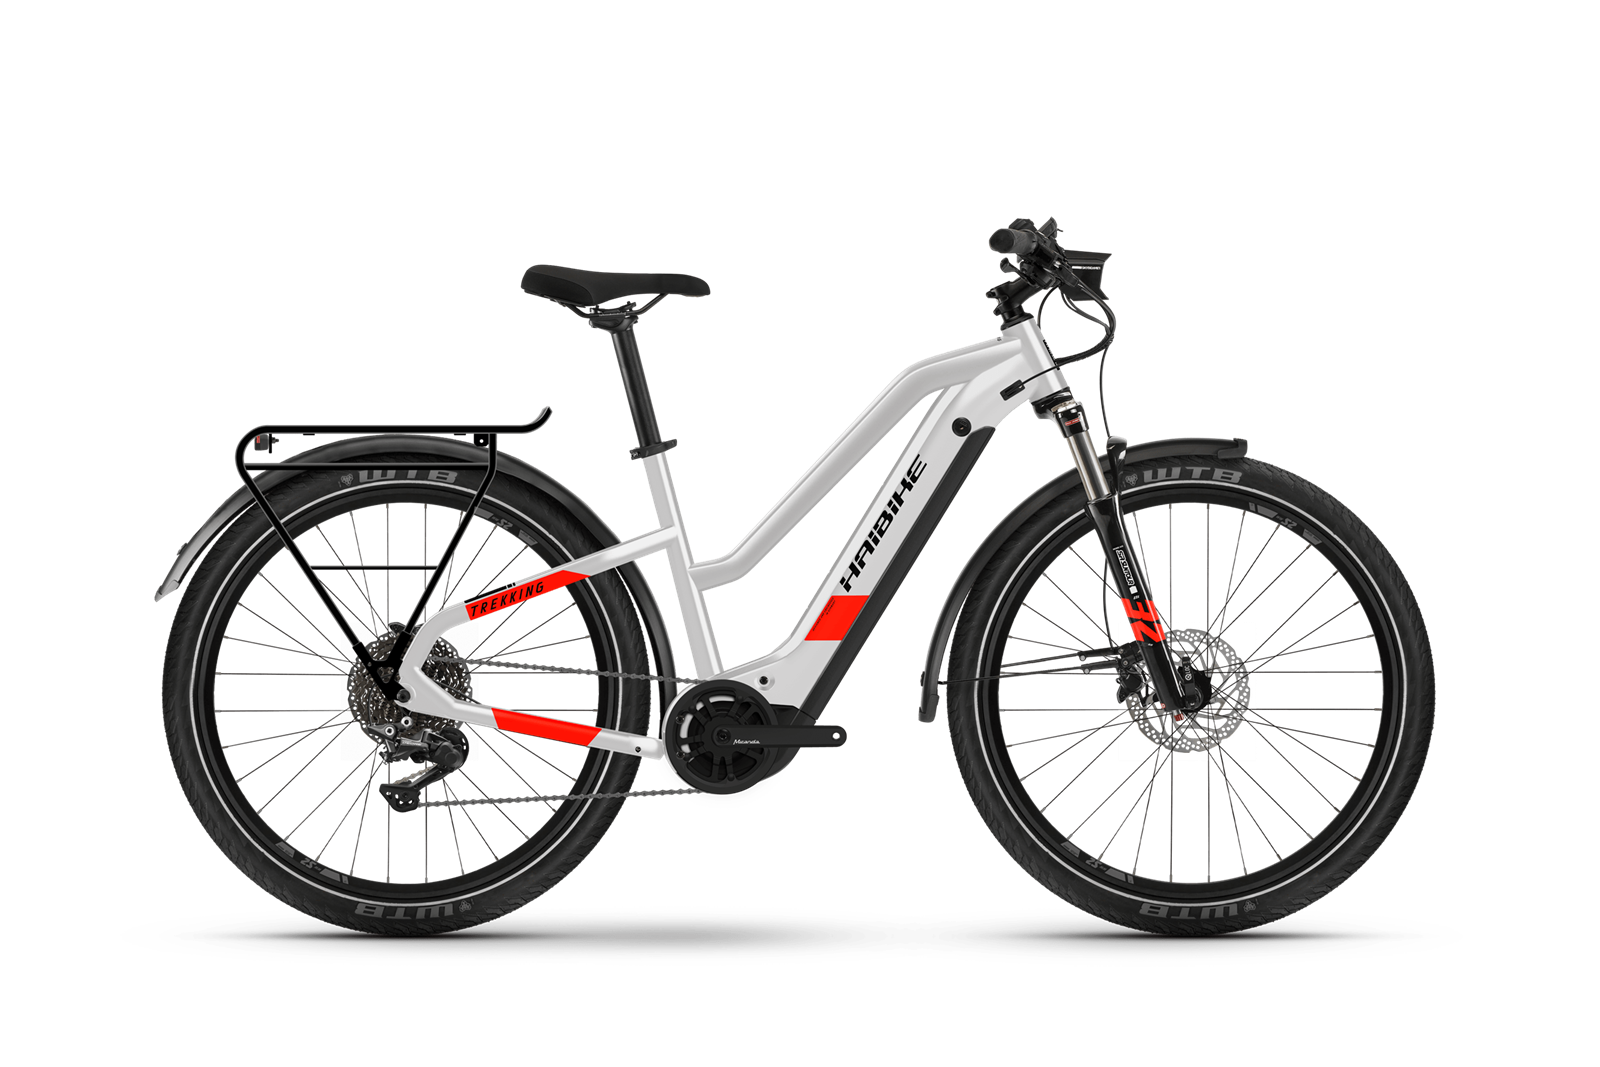 HAIBIKE Trekking 7 Lowstandover trekking pedelec kerékpár - szürke - XL (2021)